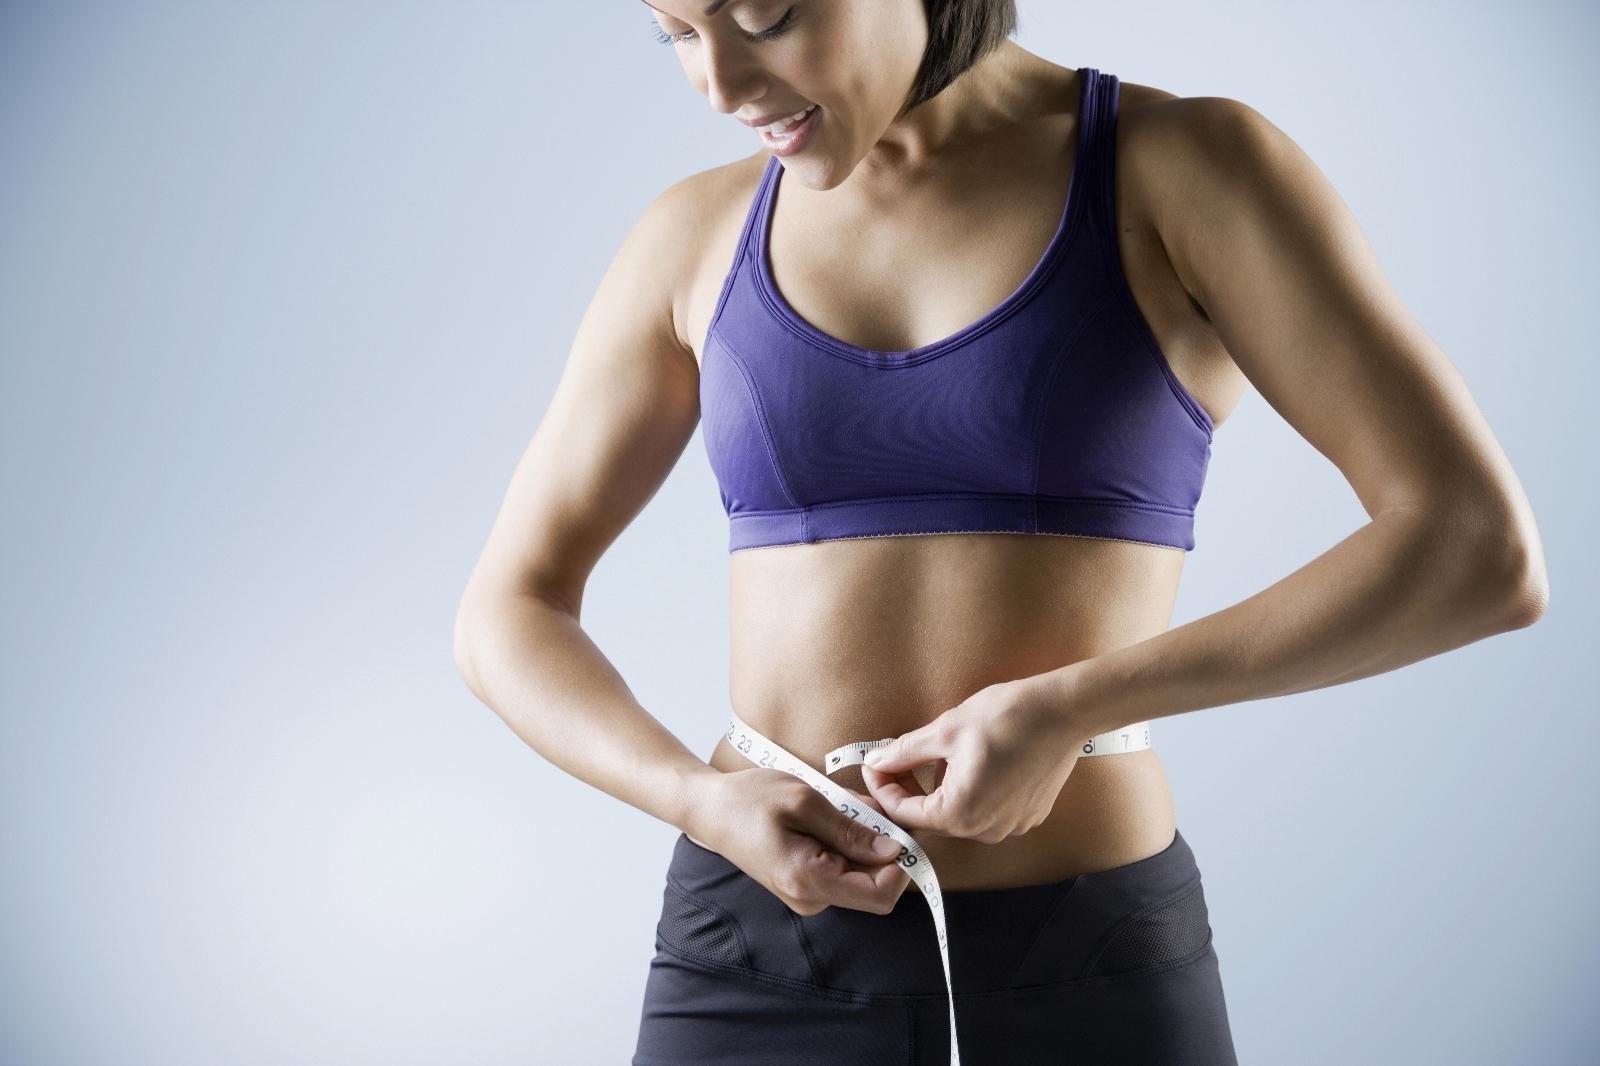 Measuring health factors like body comp